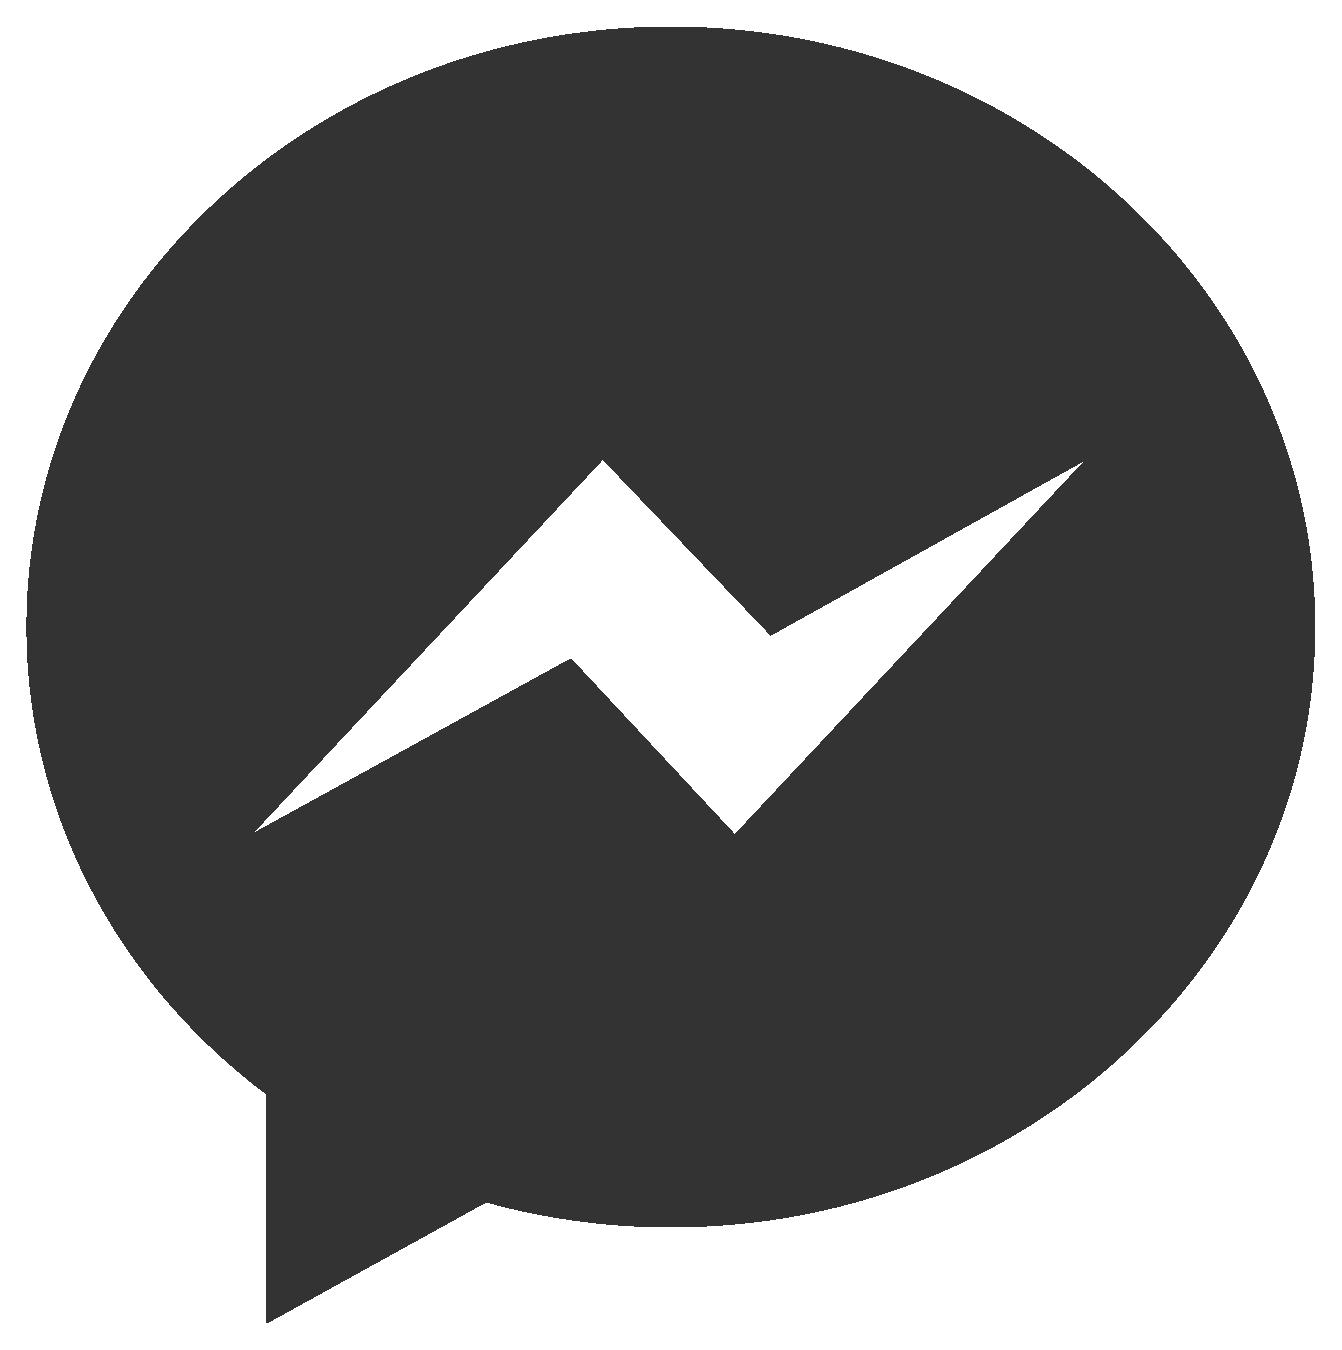 Messenger clipart free graphic free download Facebook Messenger Logo Transparent PNG Pictures - Free Icons and ... graphic free download